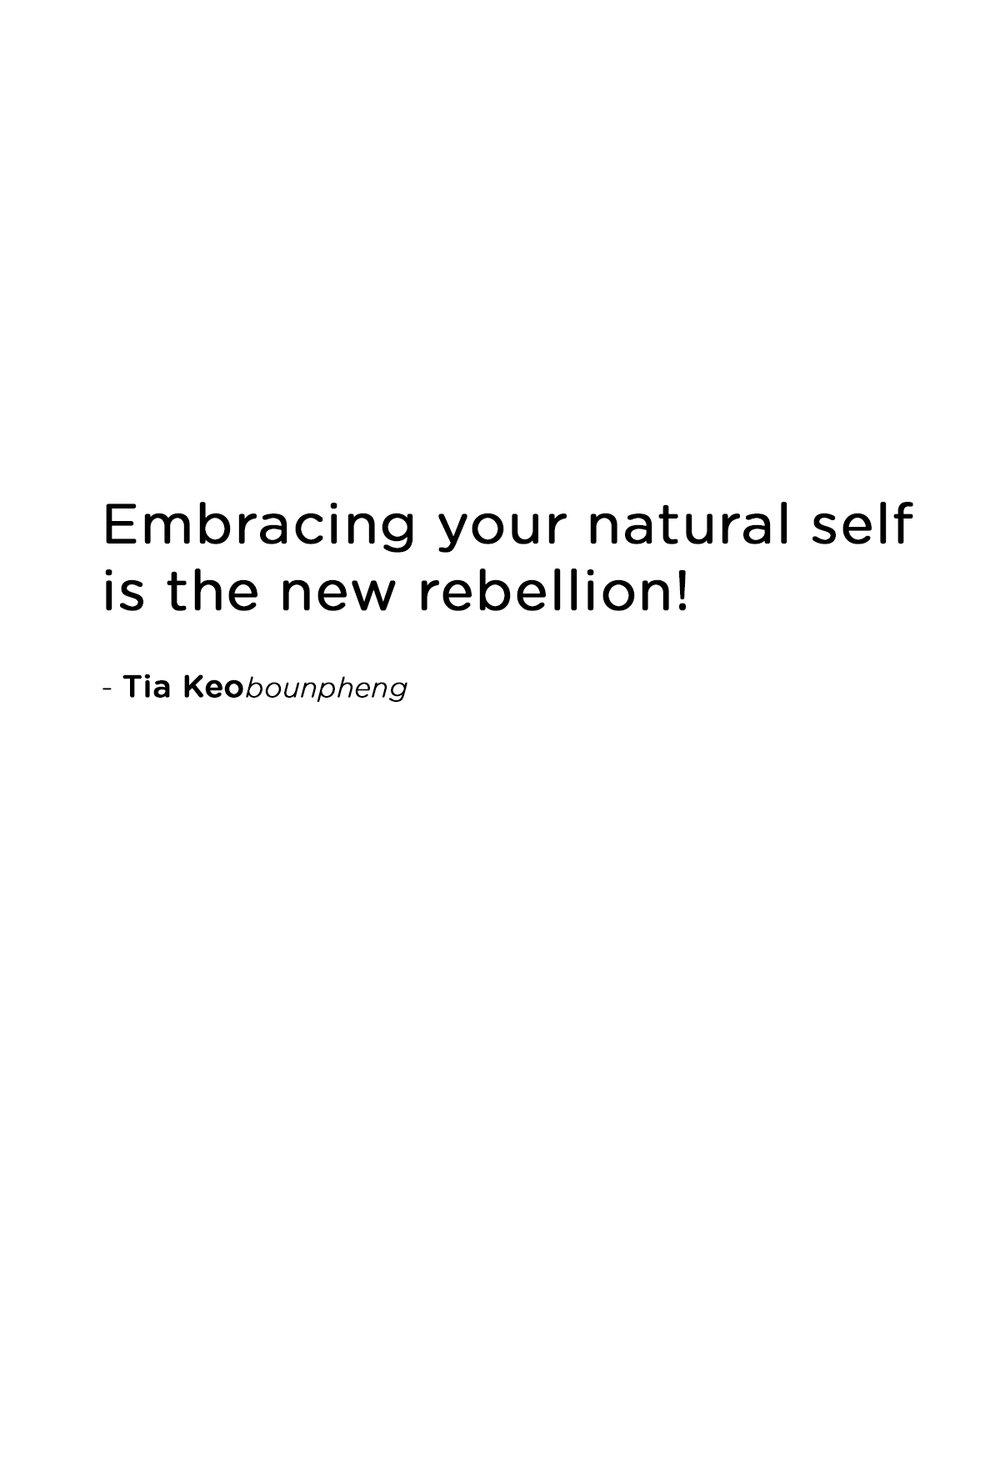 The New Rebellion_pin.jpg